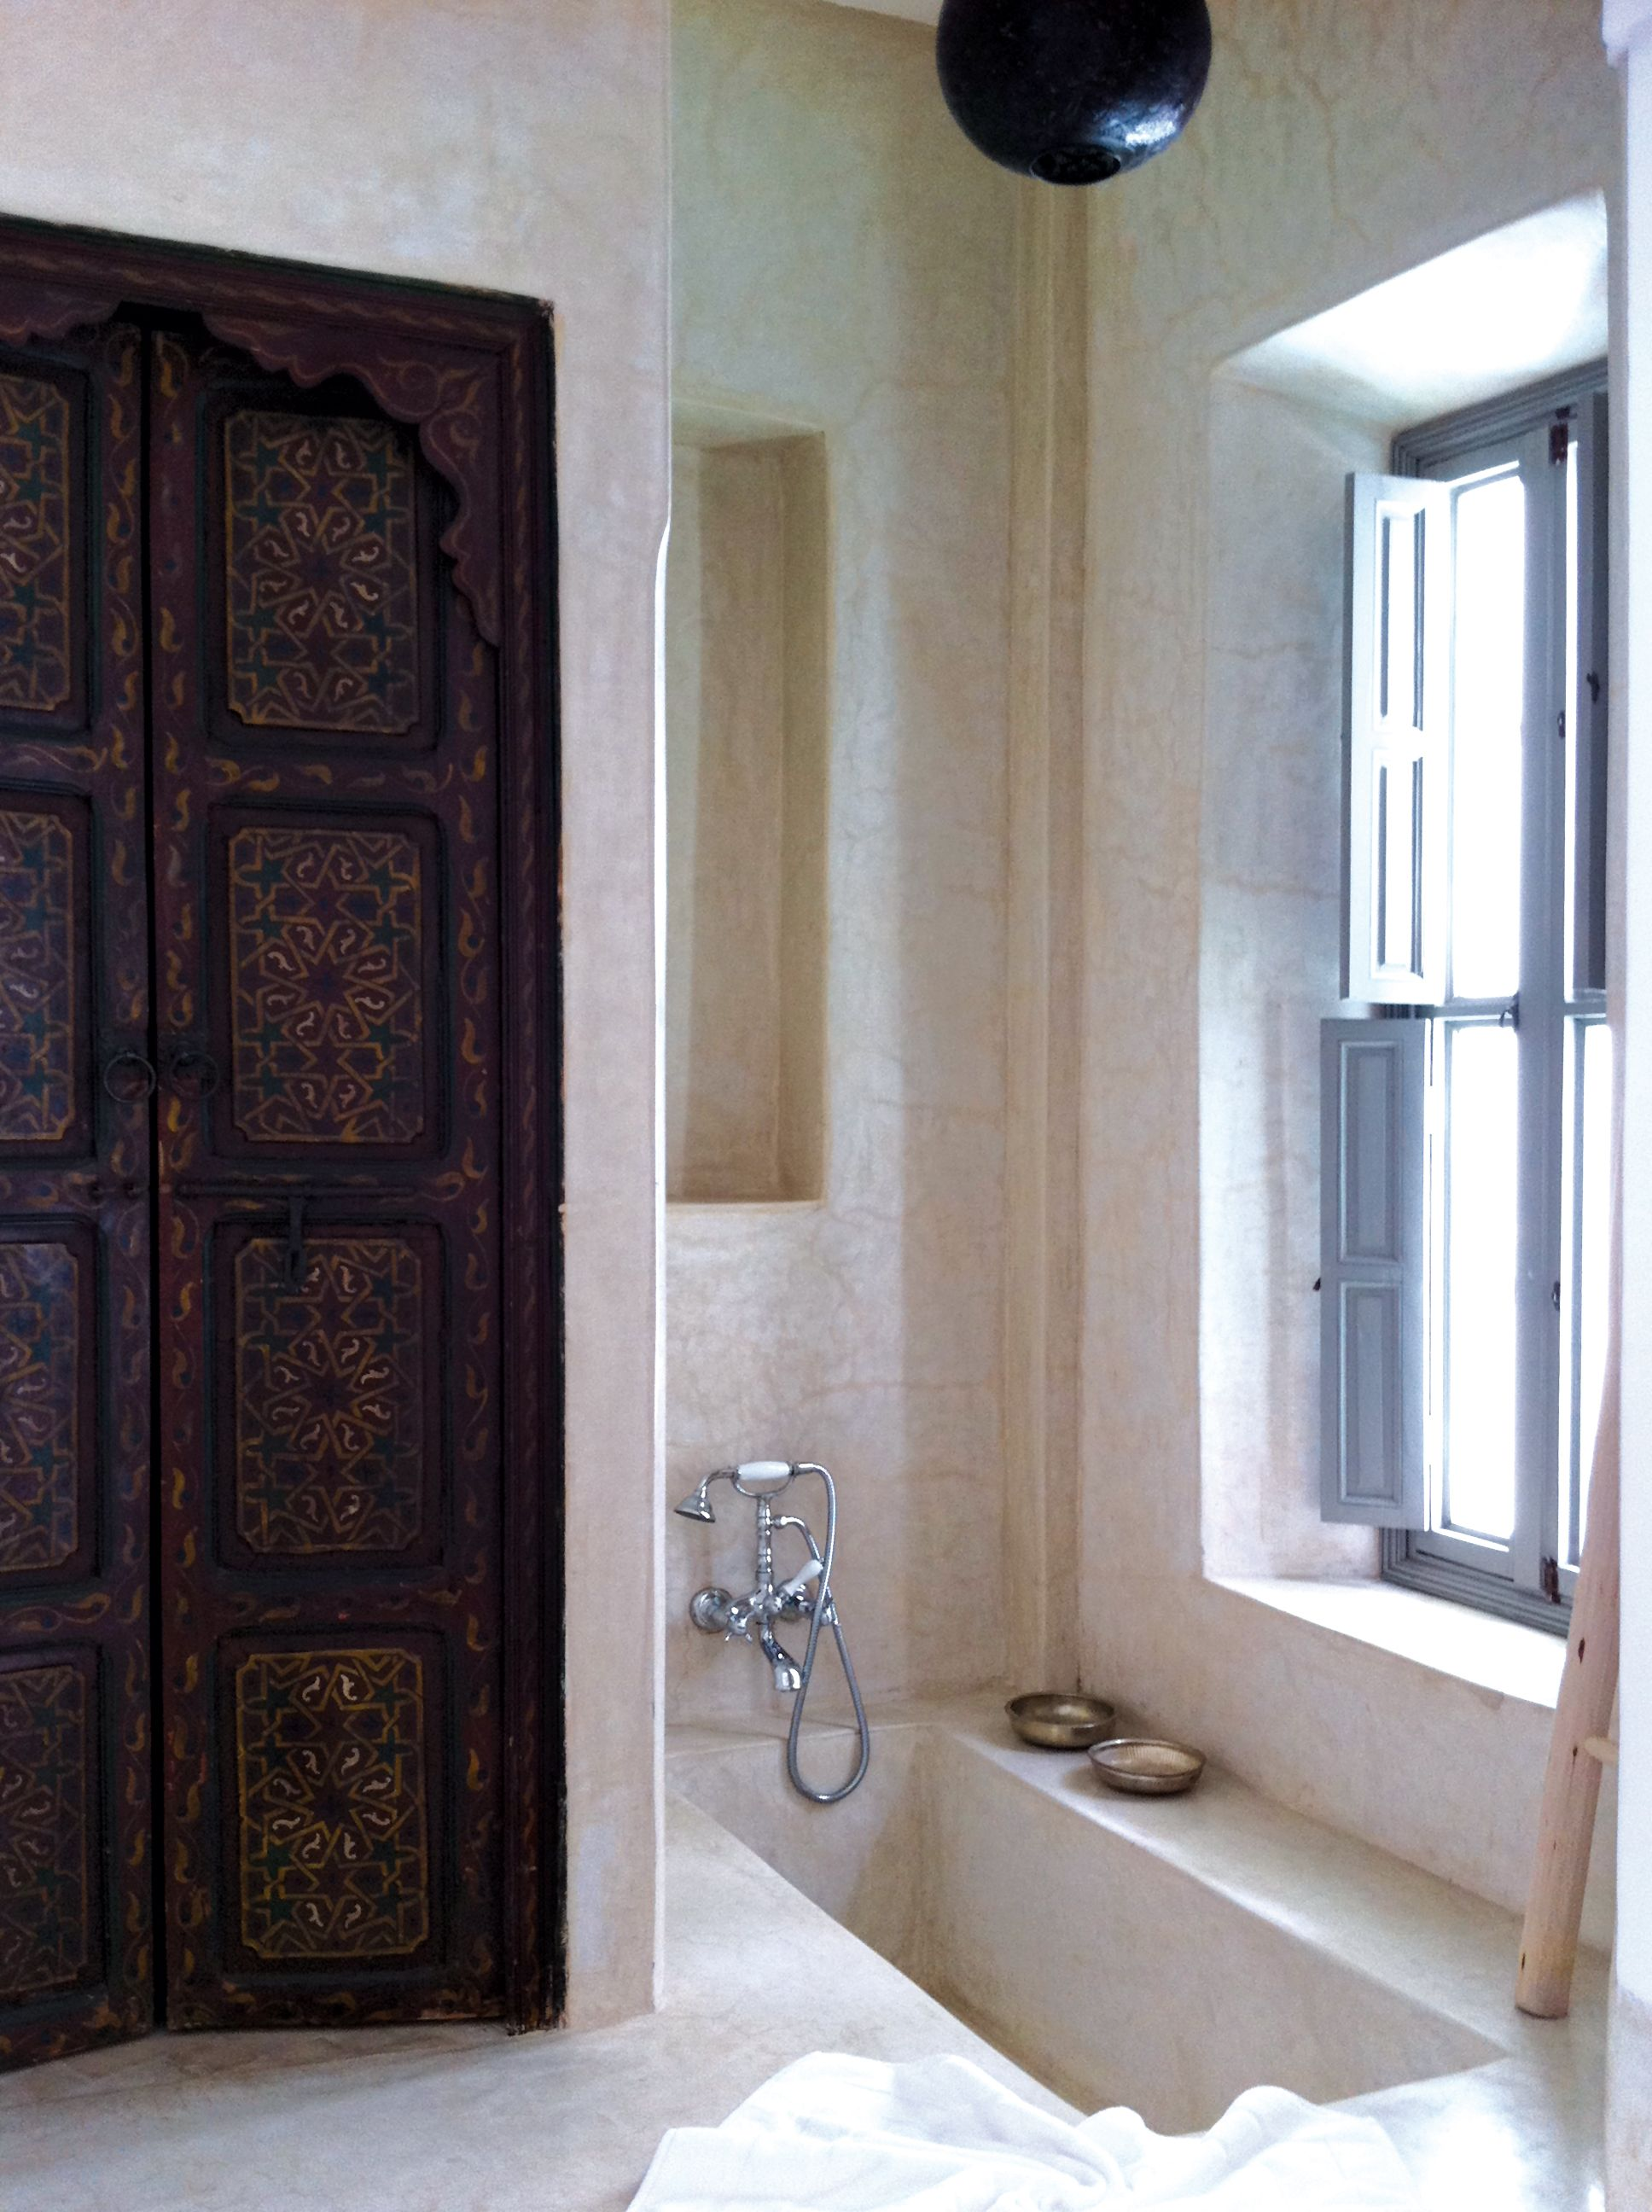 Salle De Bain Style Riad ~ snan13 riad marrakech snan13 riad marrakech pinterest maroc